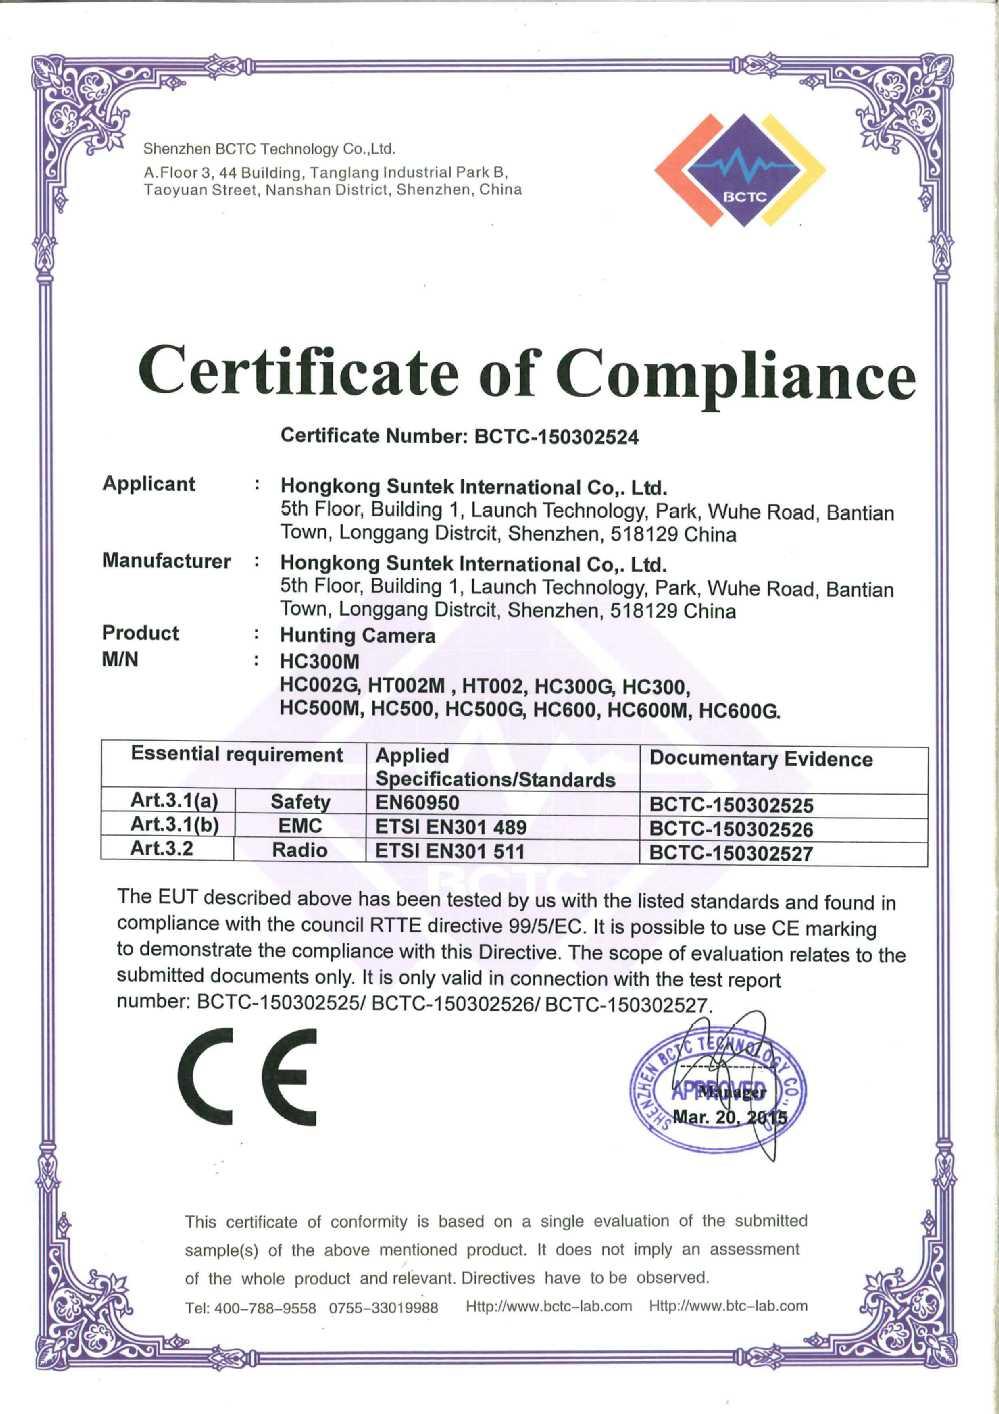 HC300M RTTE certificate